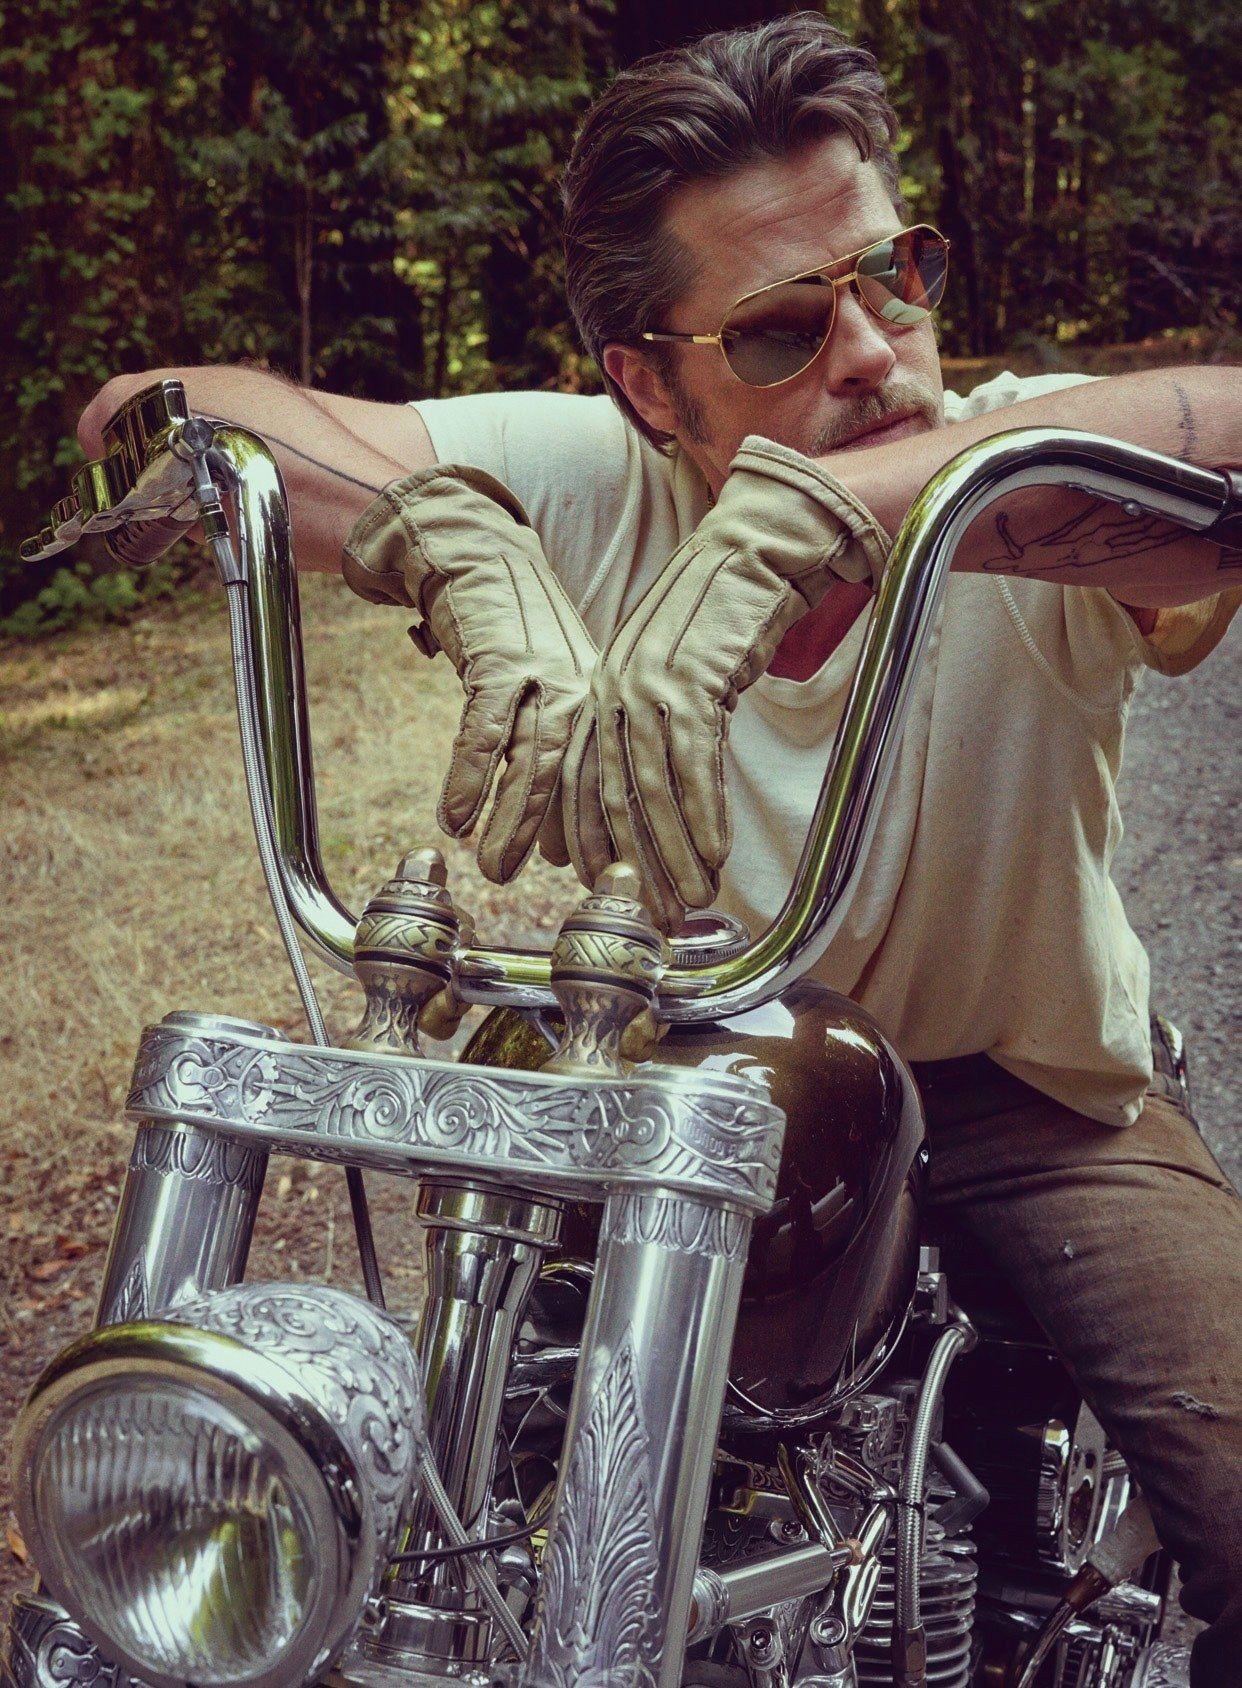 Pics photos brad pitt on motorcycle - Explore Brad Pitt Motorcycle Motorcycle Boot And More